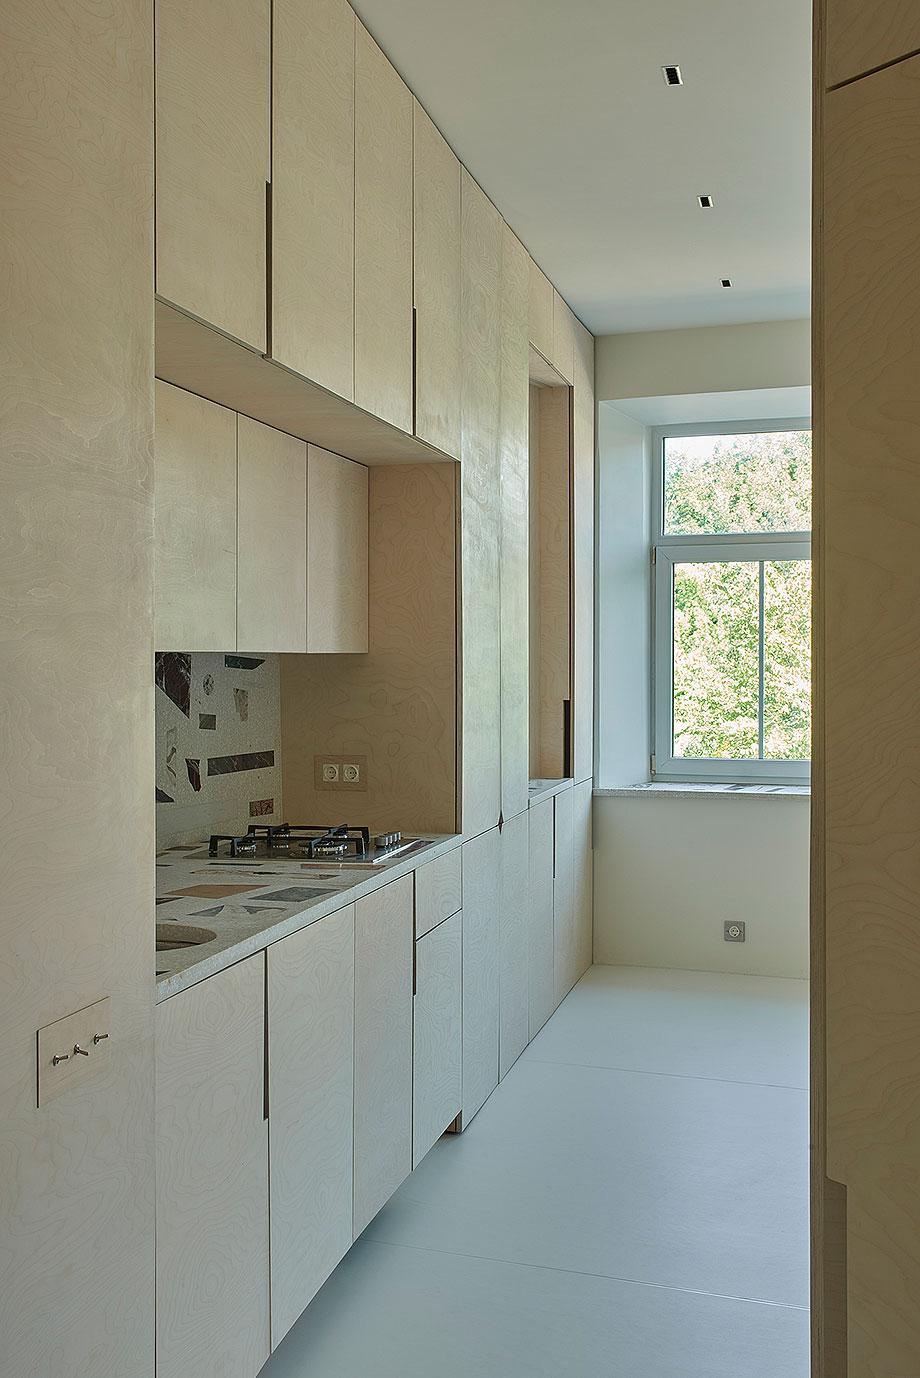 apartamento en vilna de sarkauskai architecture atelier (4) - foto darius petrulaitis